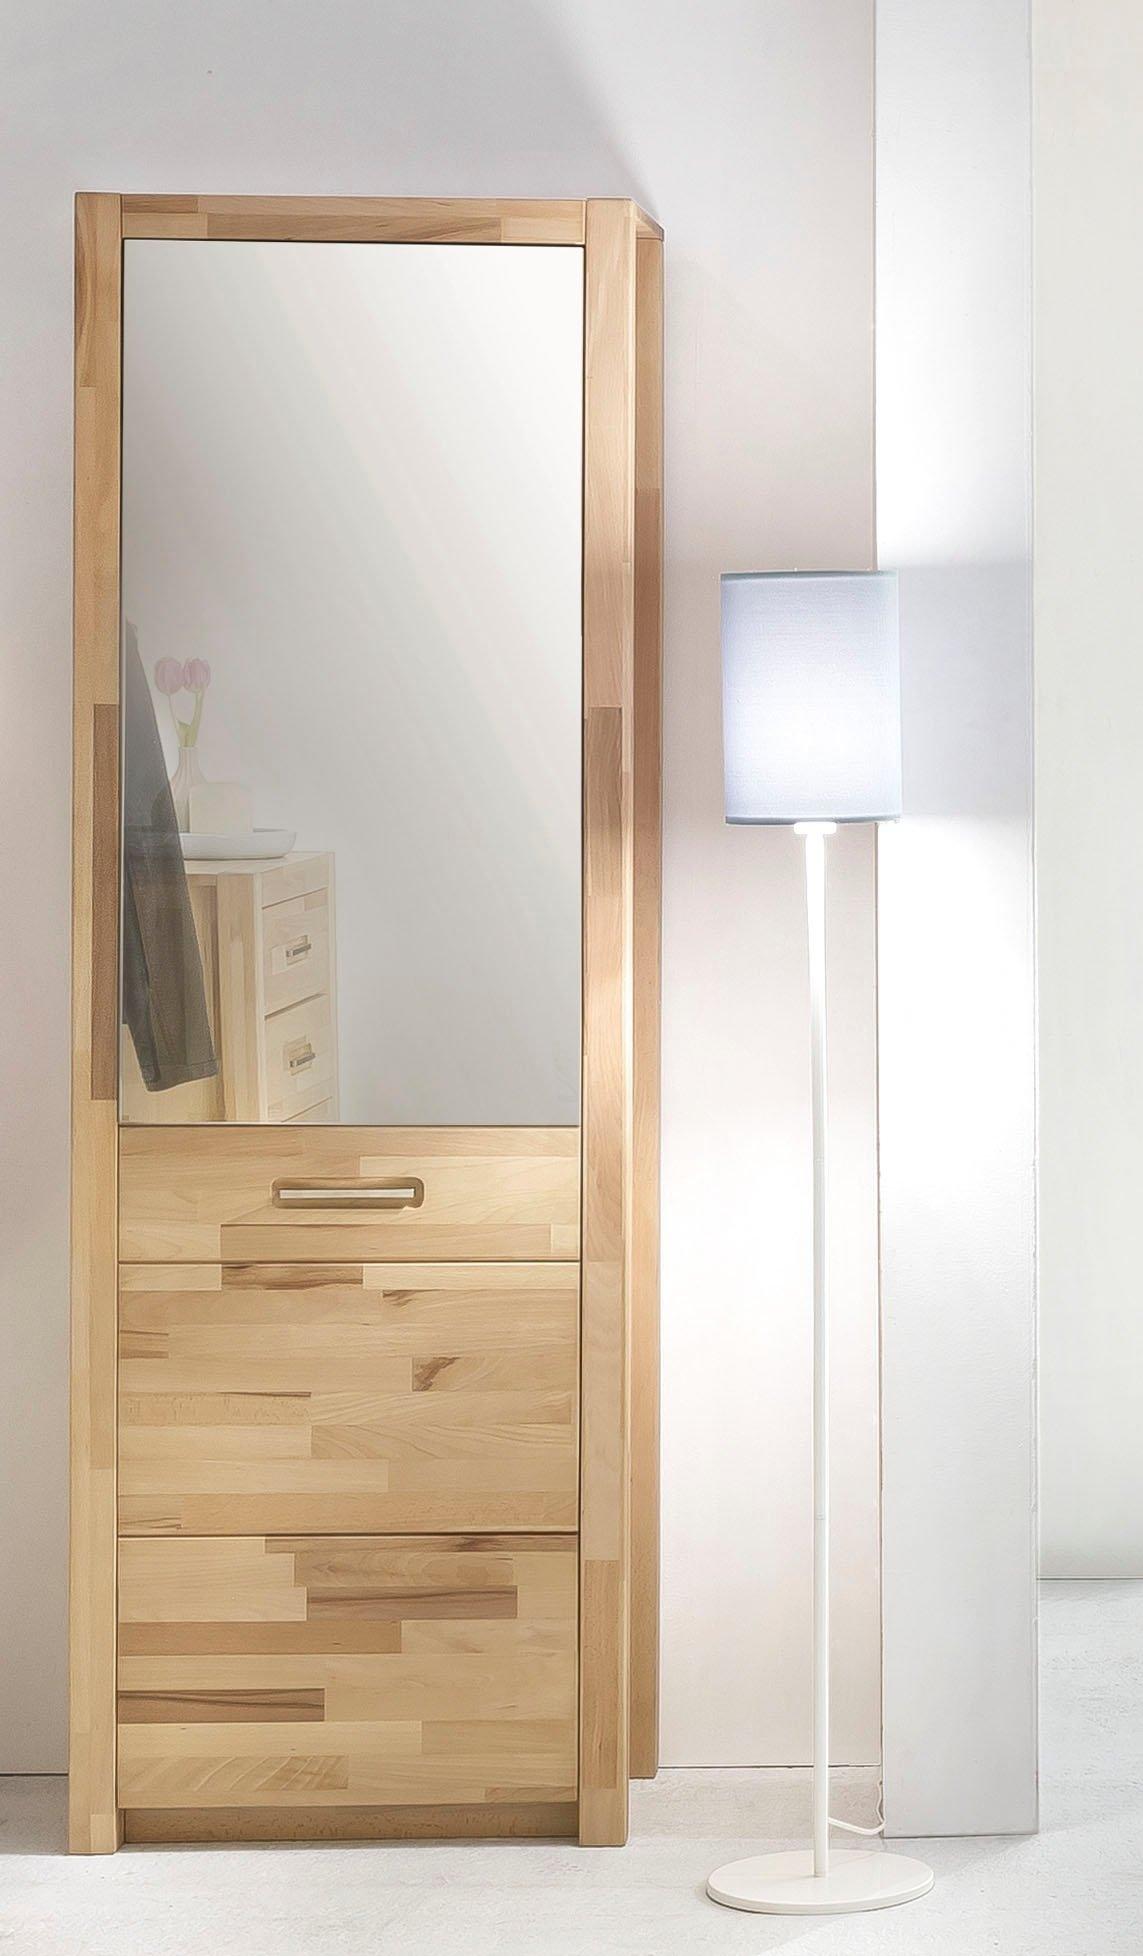 MCA furniture kledingkast Fenja Breedte 60 cm - verschillende betaalmethodes